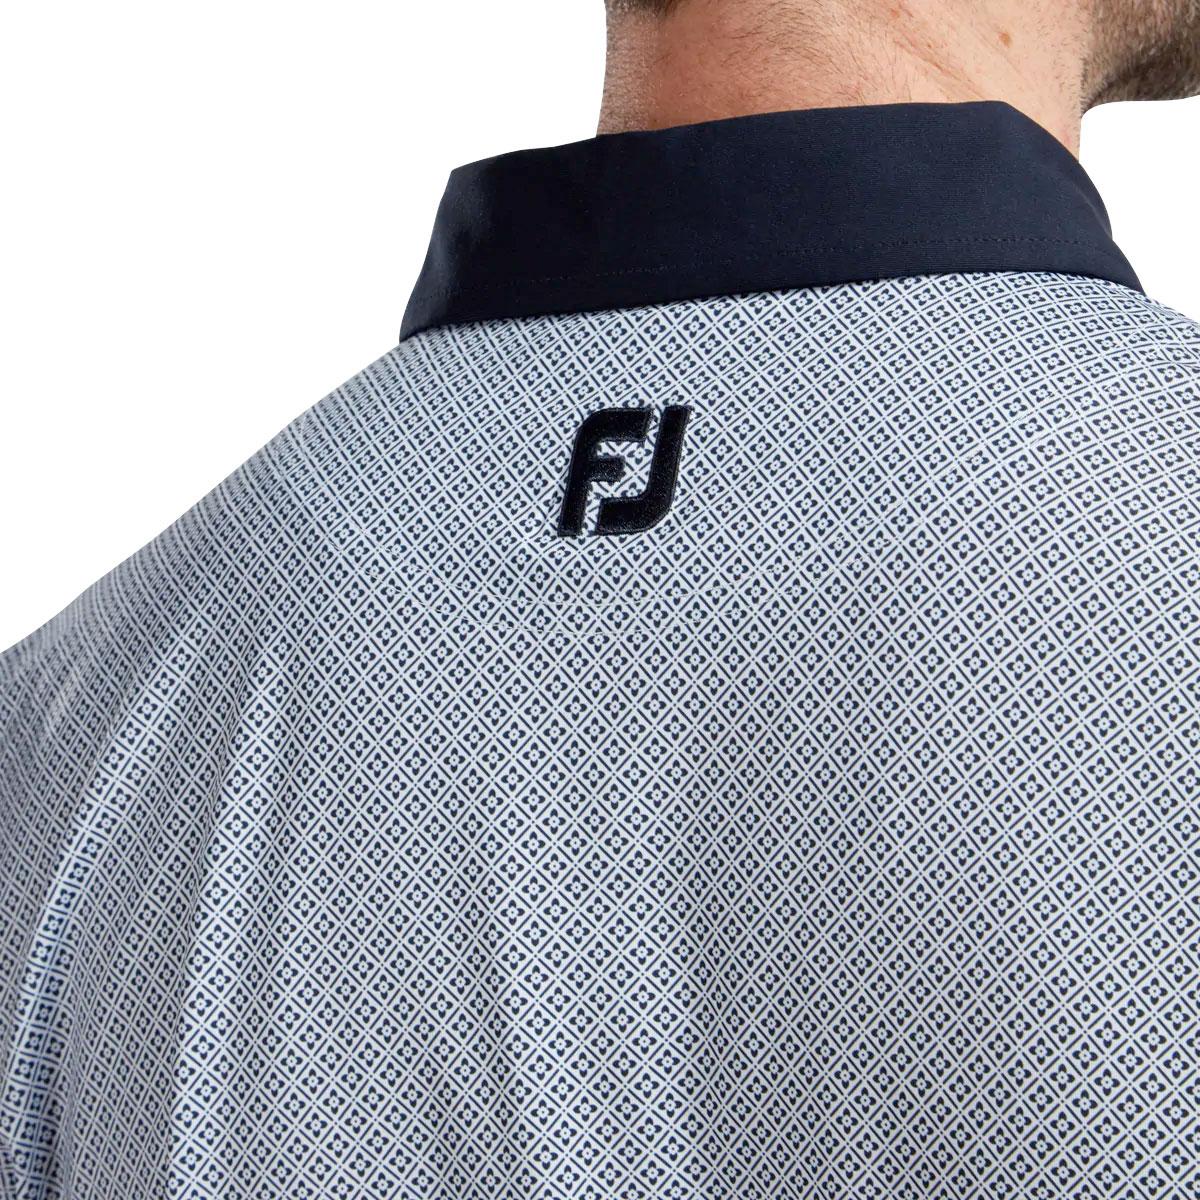 FootJoy Lisle Foulard Print Mens Golf Polo Shirt